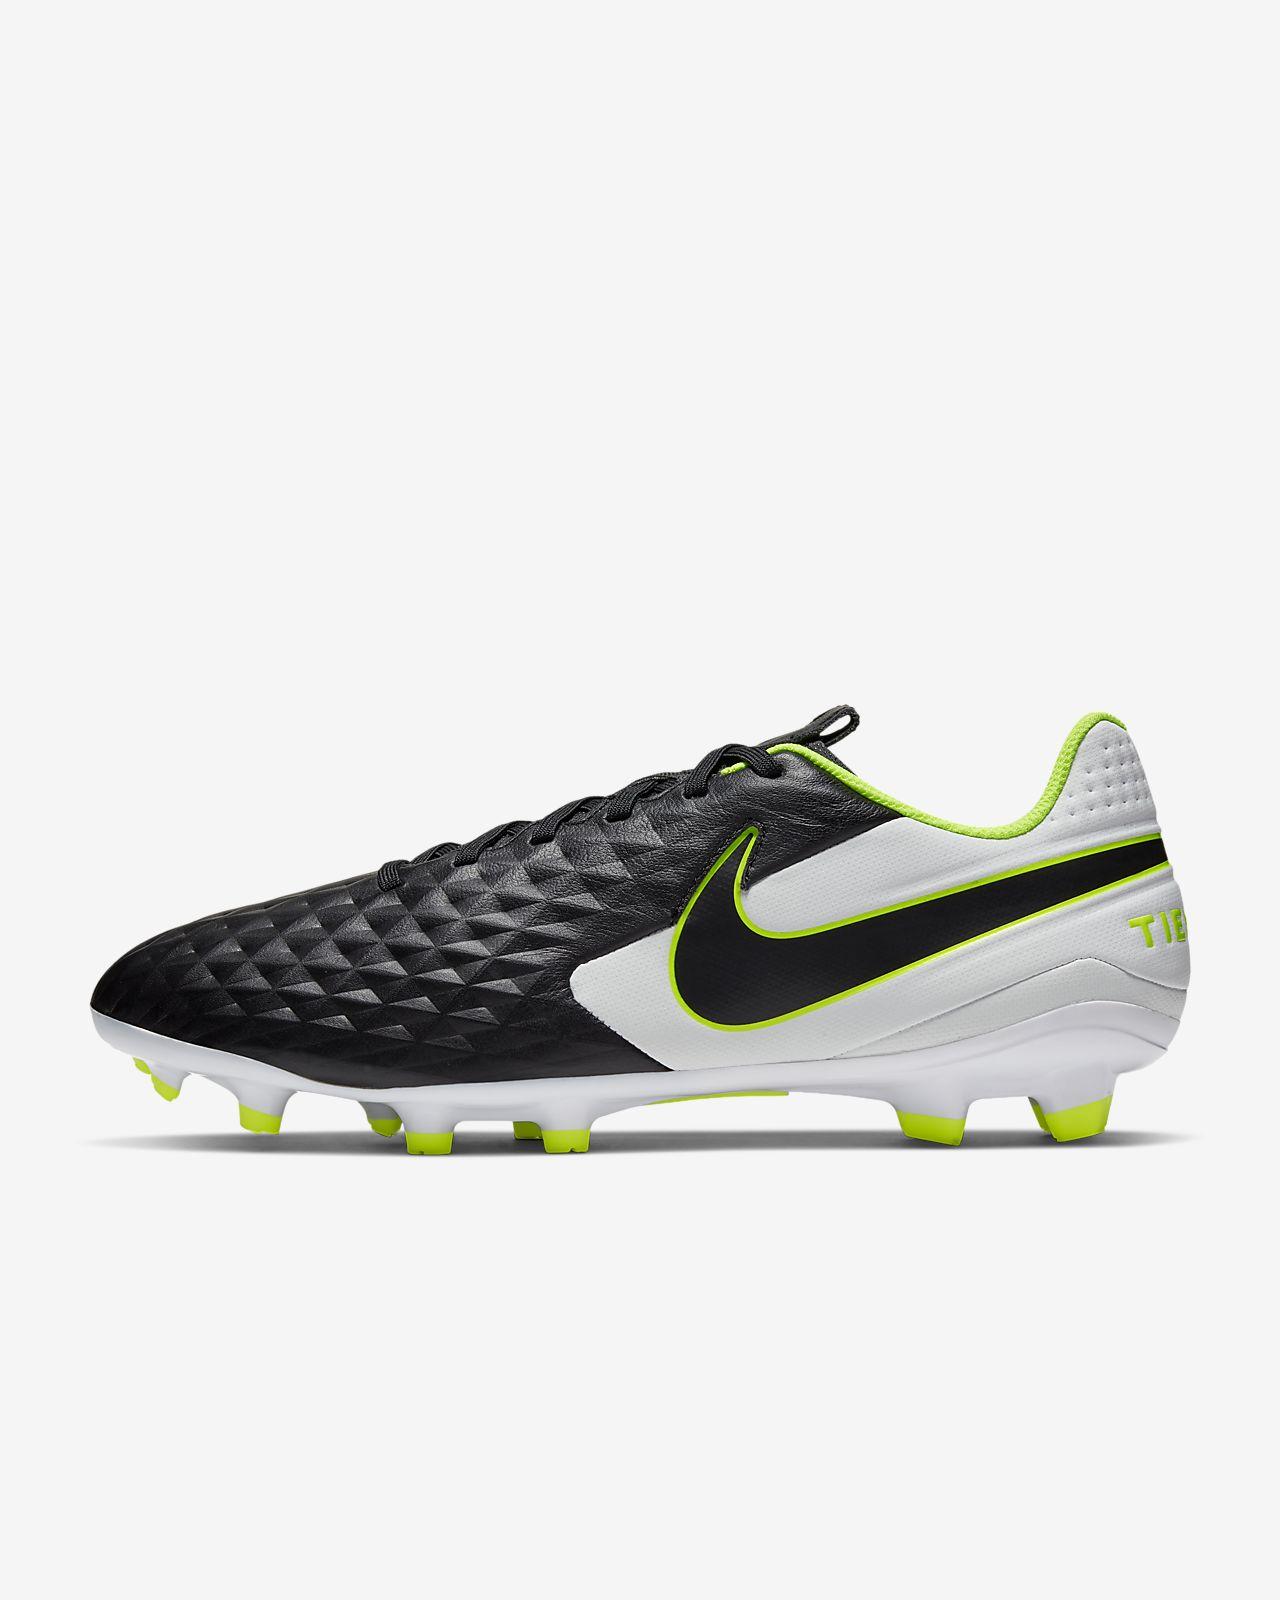 Nike Tiempo Legend 8 Academy MG Multi-Ground Football Boot